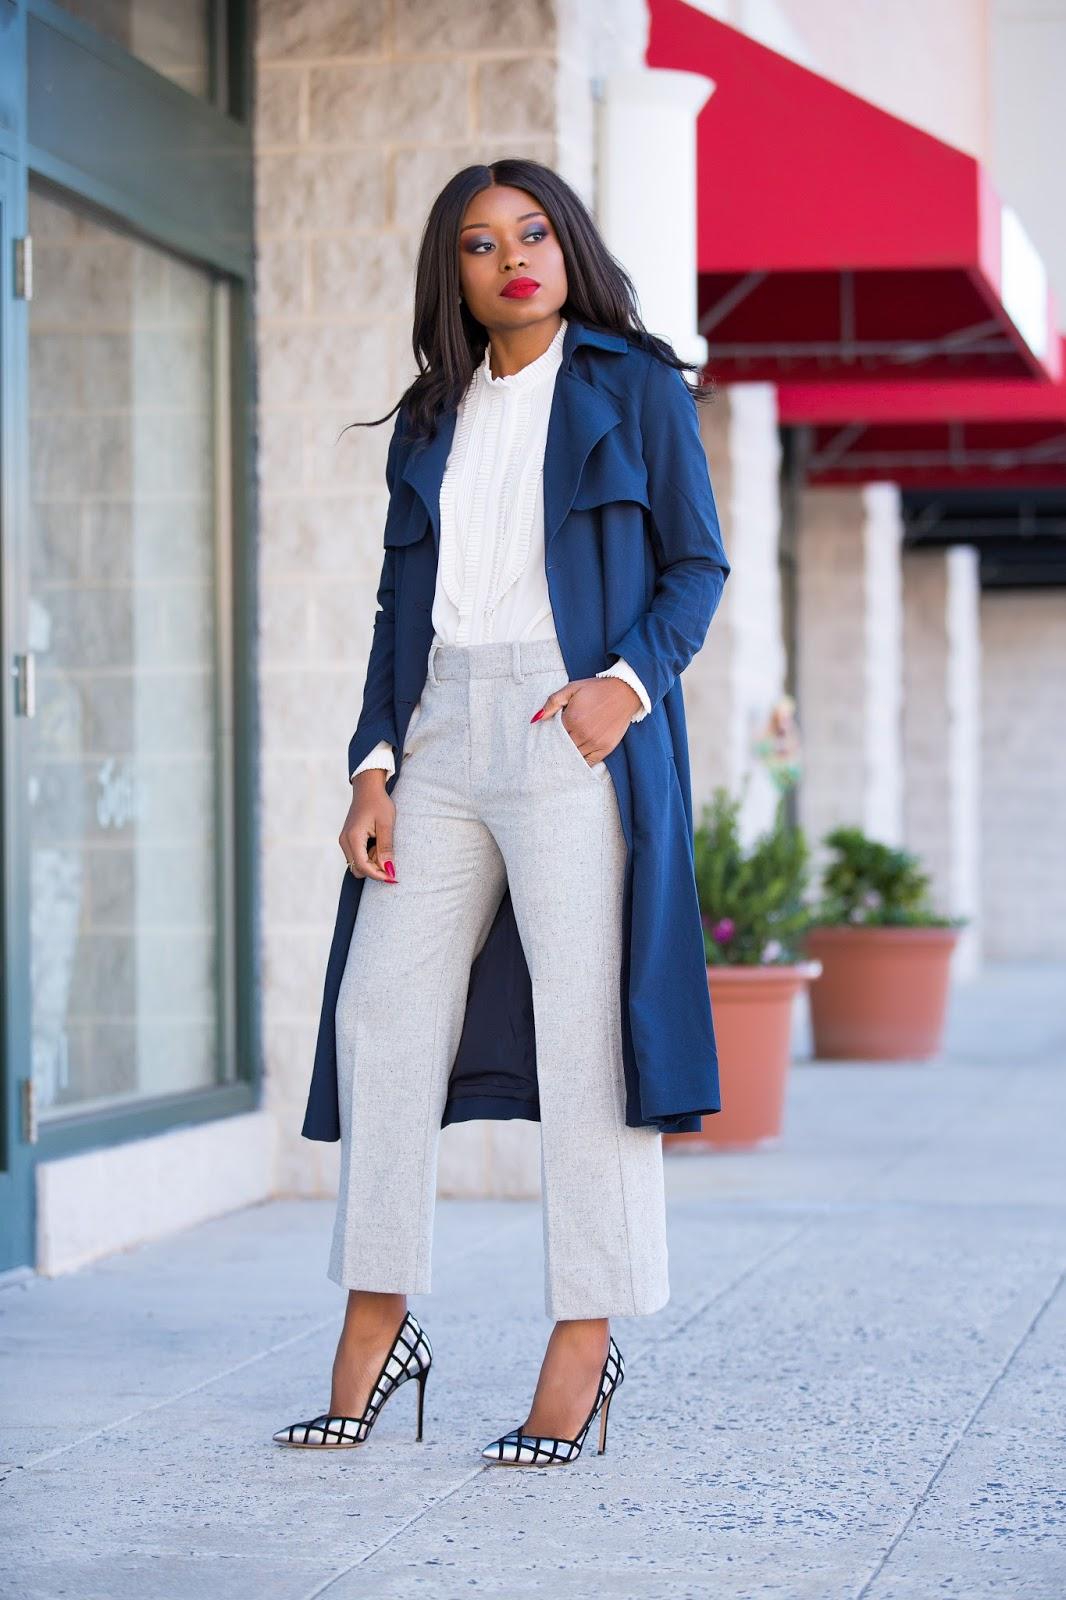 AYR cropped pants, www.jadore-fashion.com